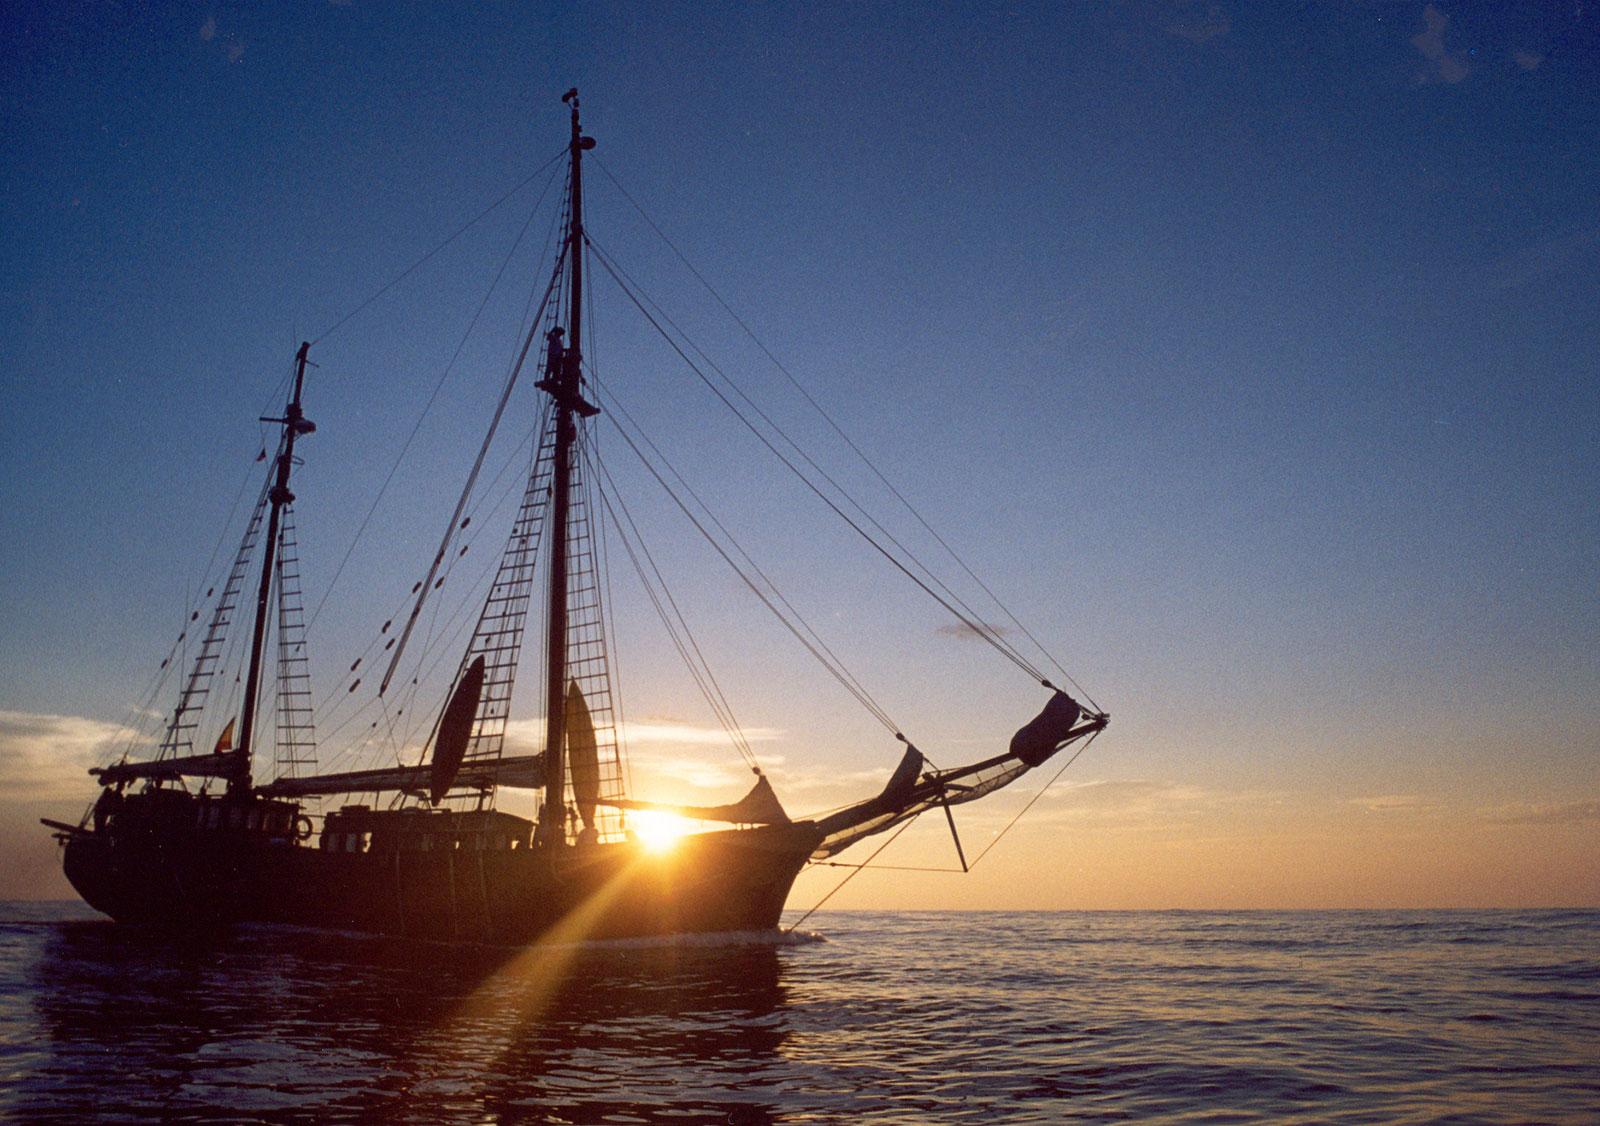 Mallorca-segelschiff-charter-mallorca-historisches-segelboot-mieten-mallorca-1